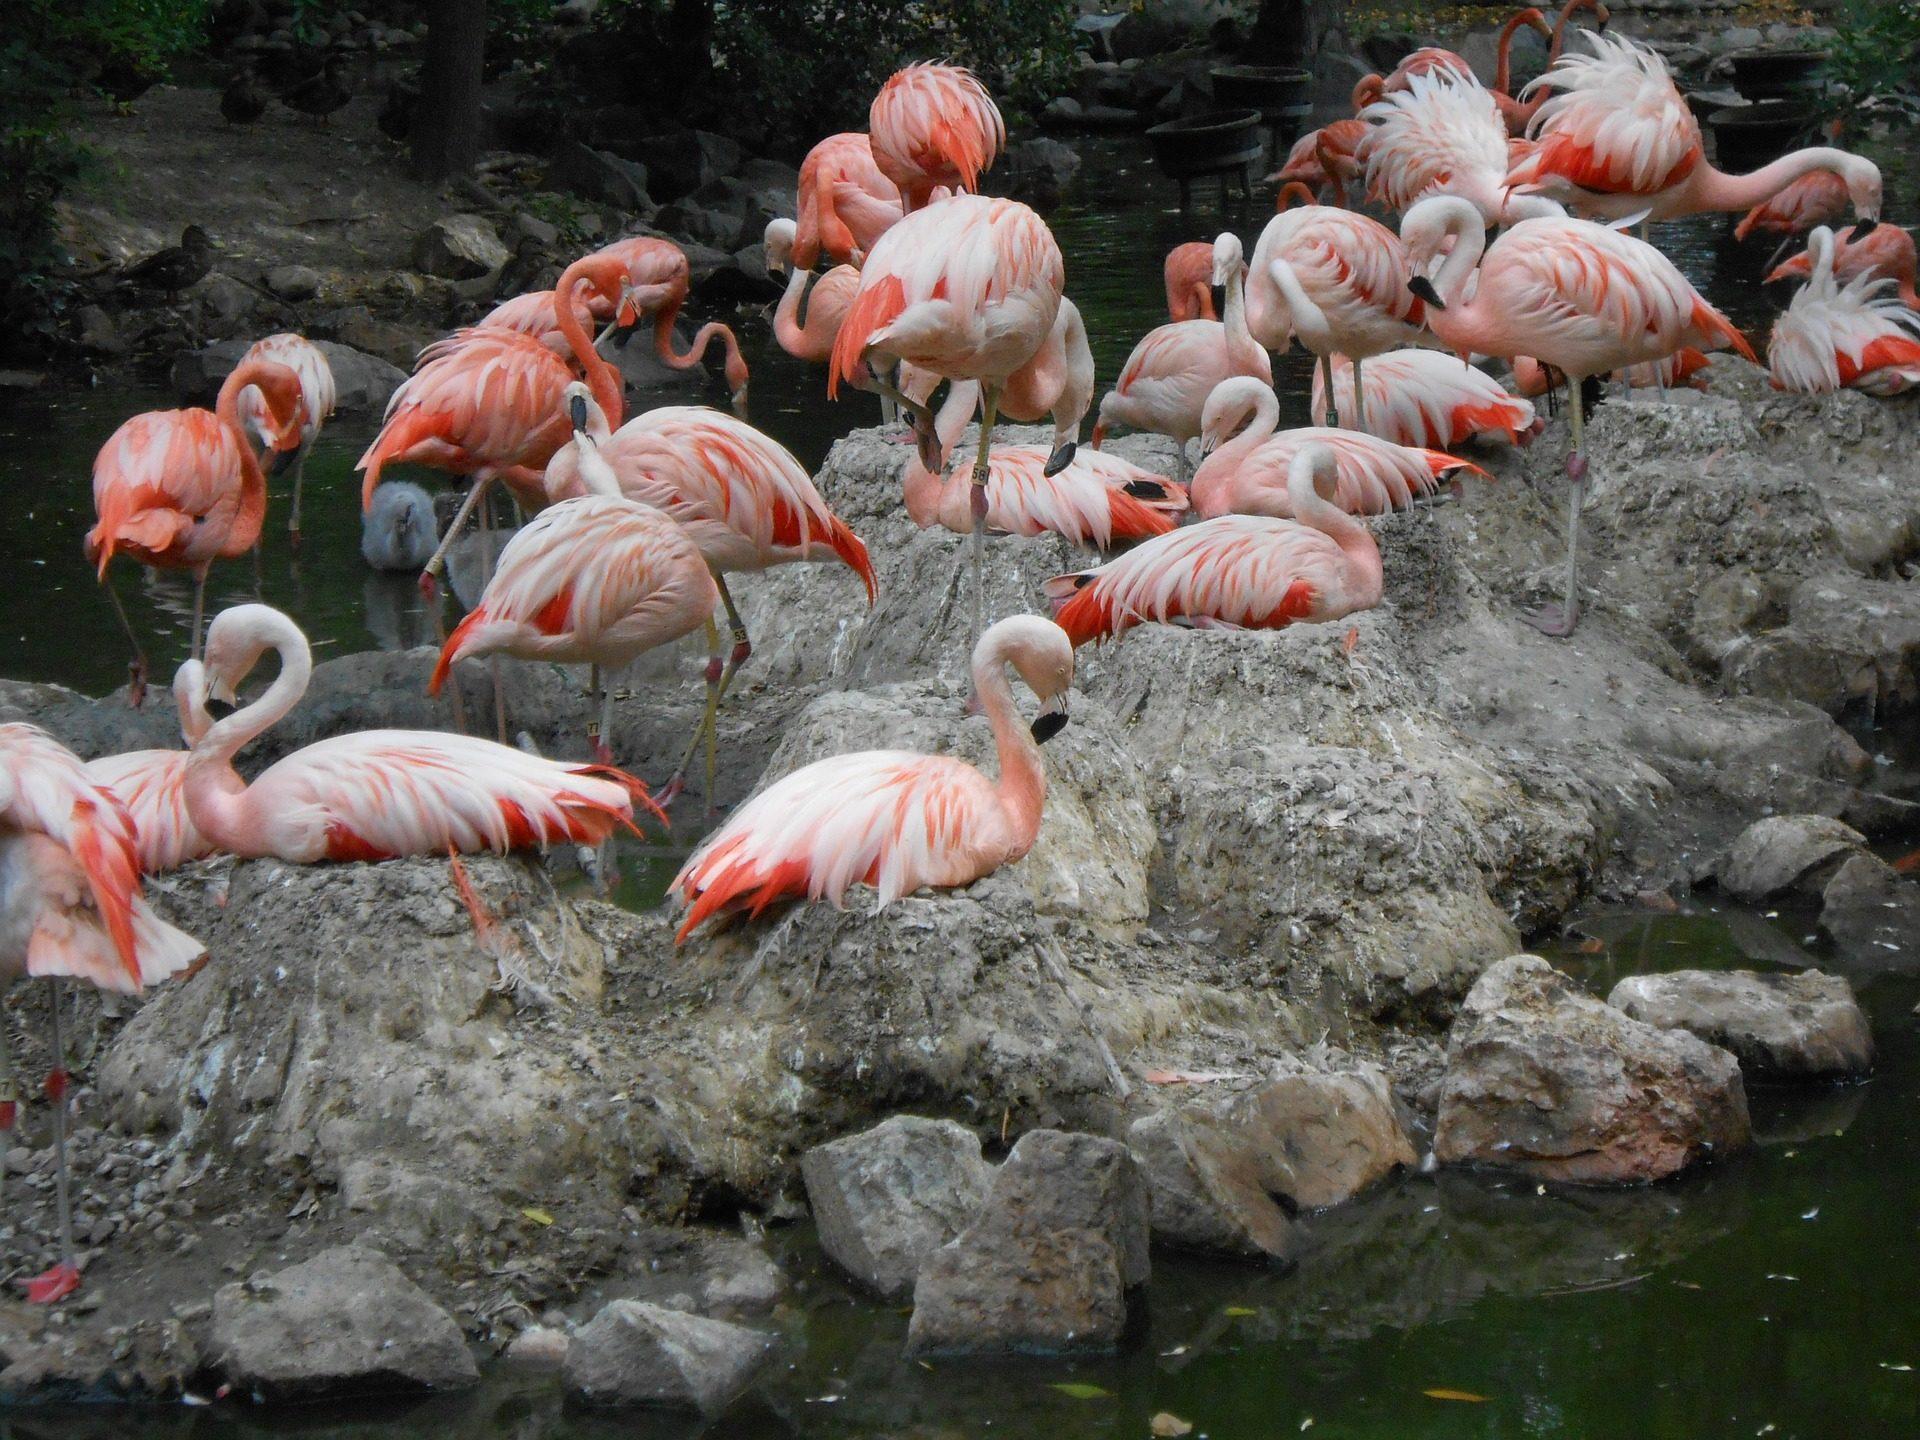 Flamingos, Vögel, Watvögel, Herde, Steinen, Lake, Rosa - Wallpaper HD - Prof.-falken.com